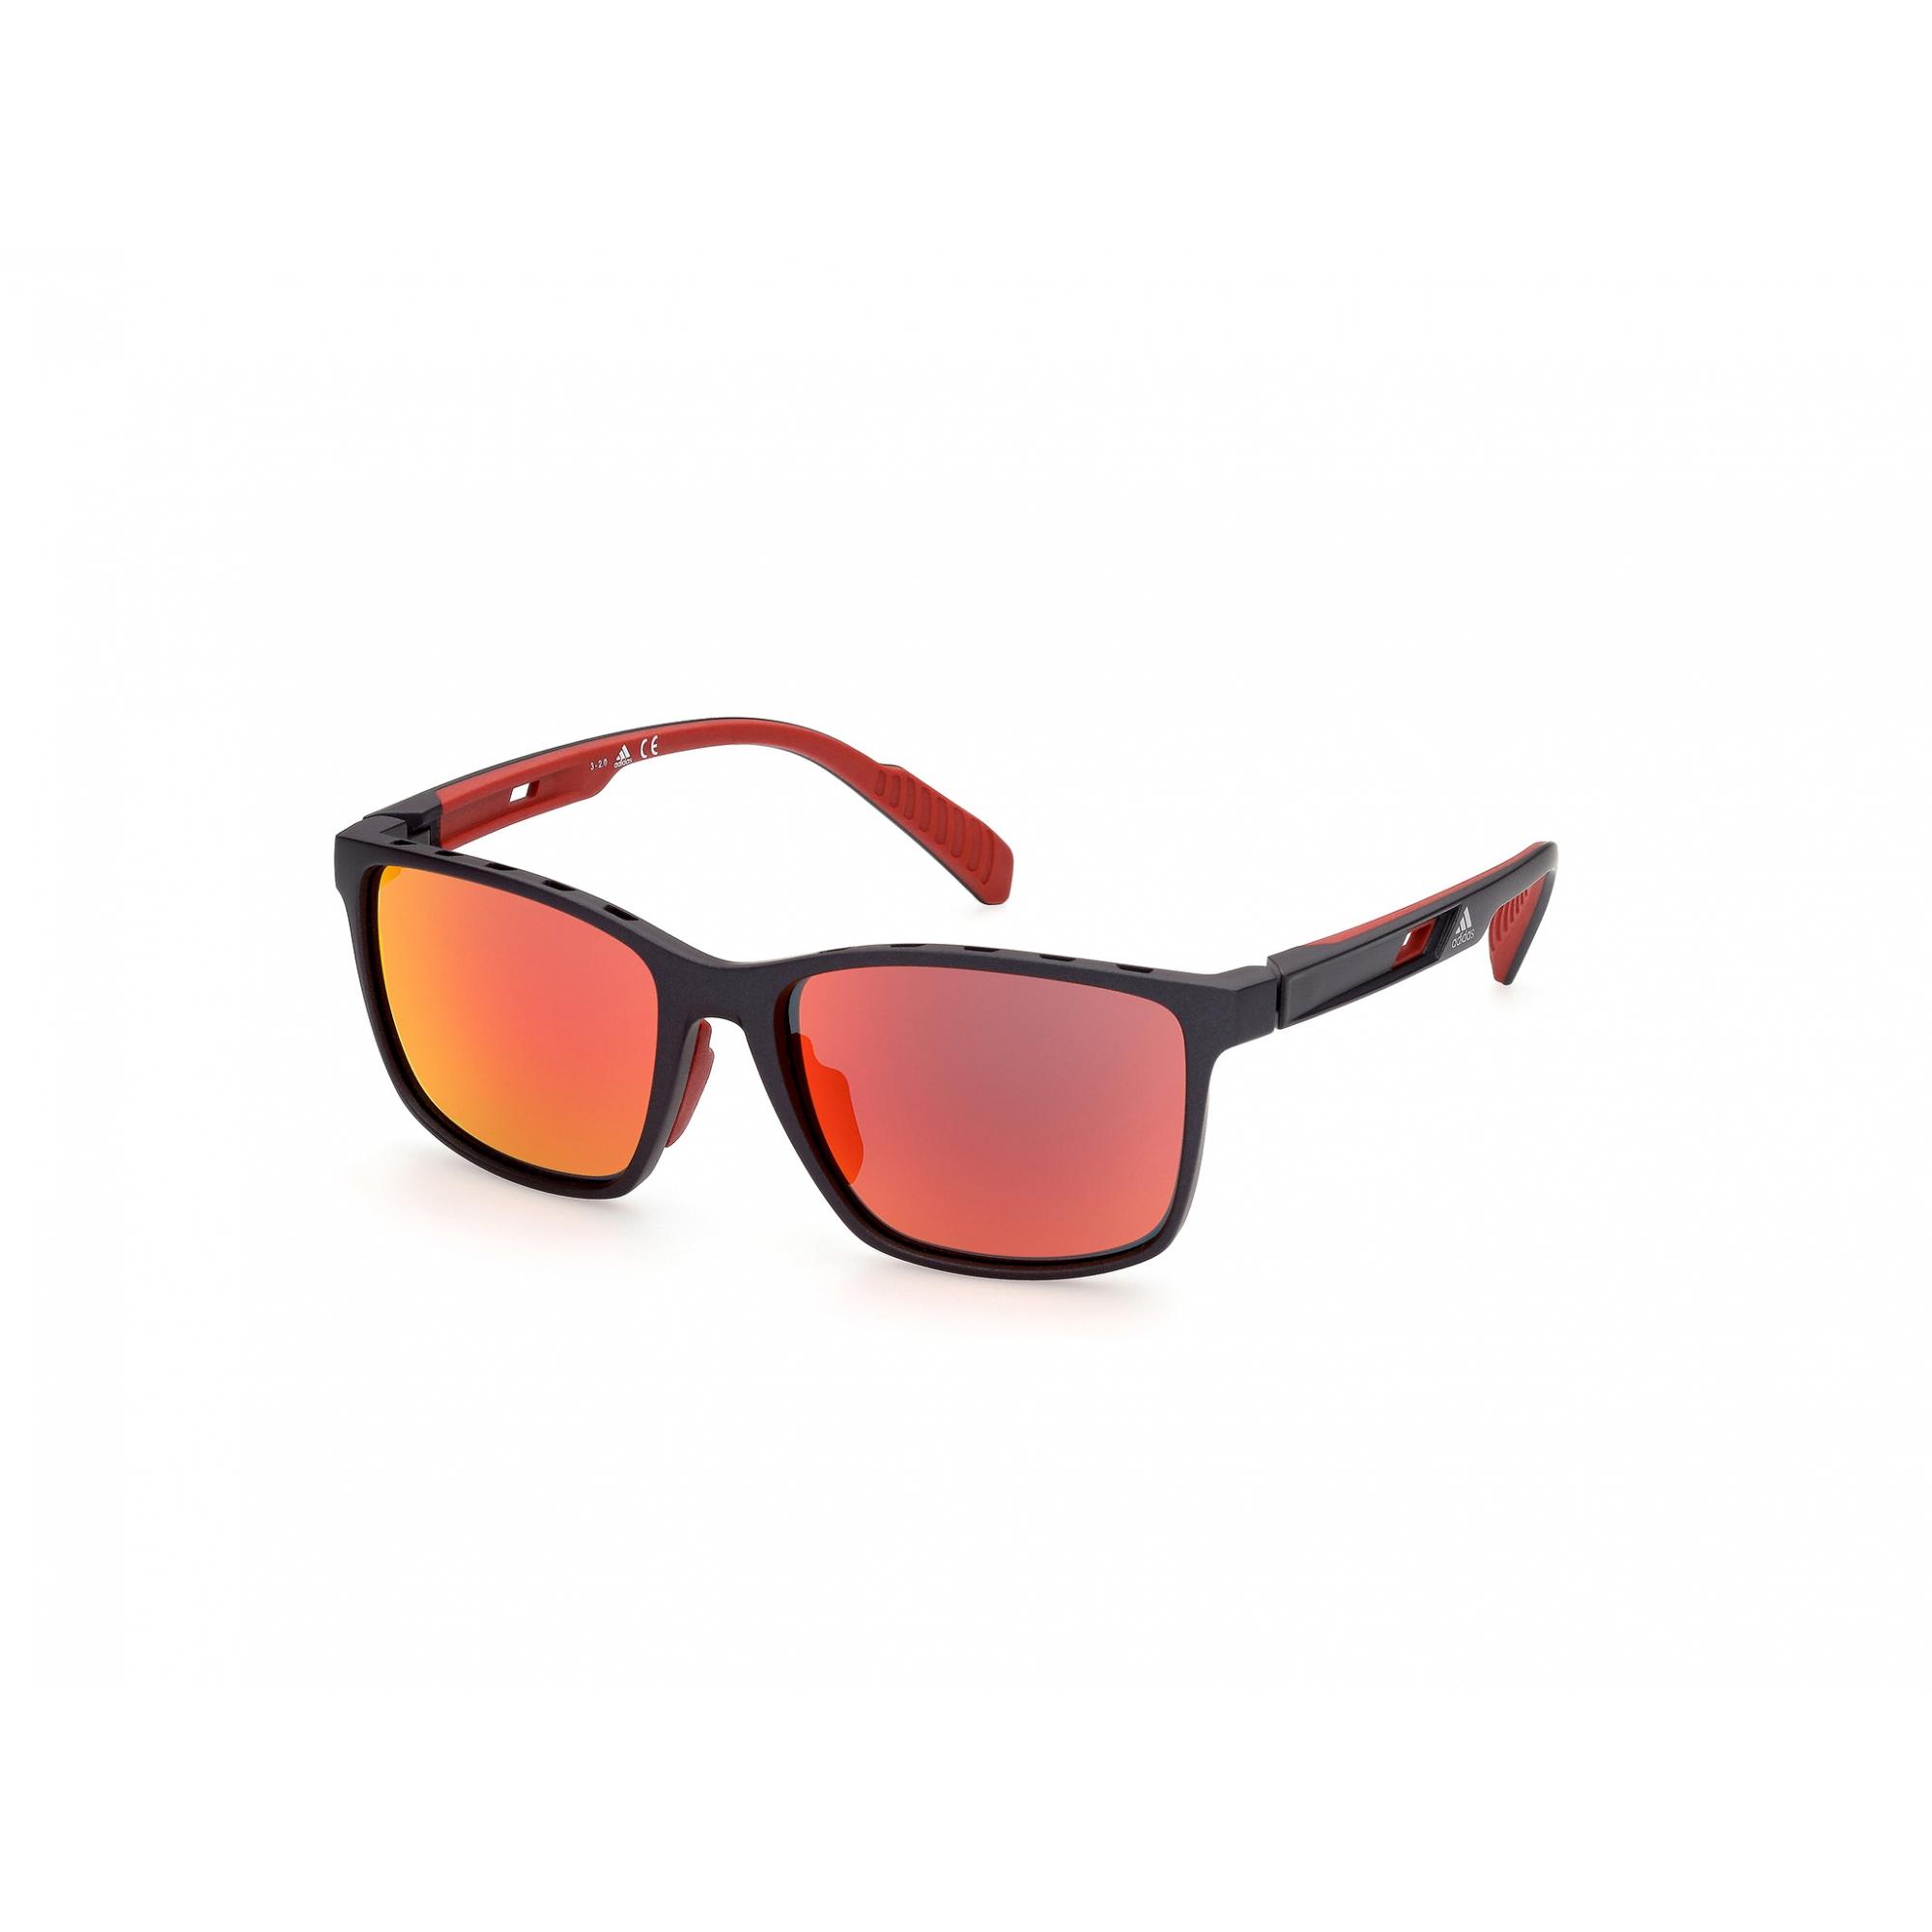 Adidas SP0035 02L 56